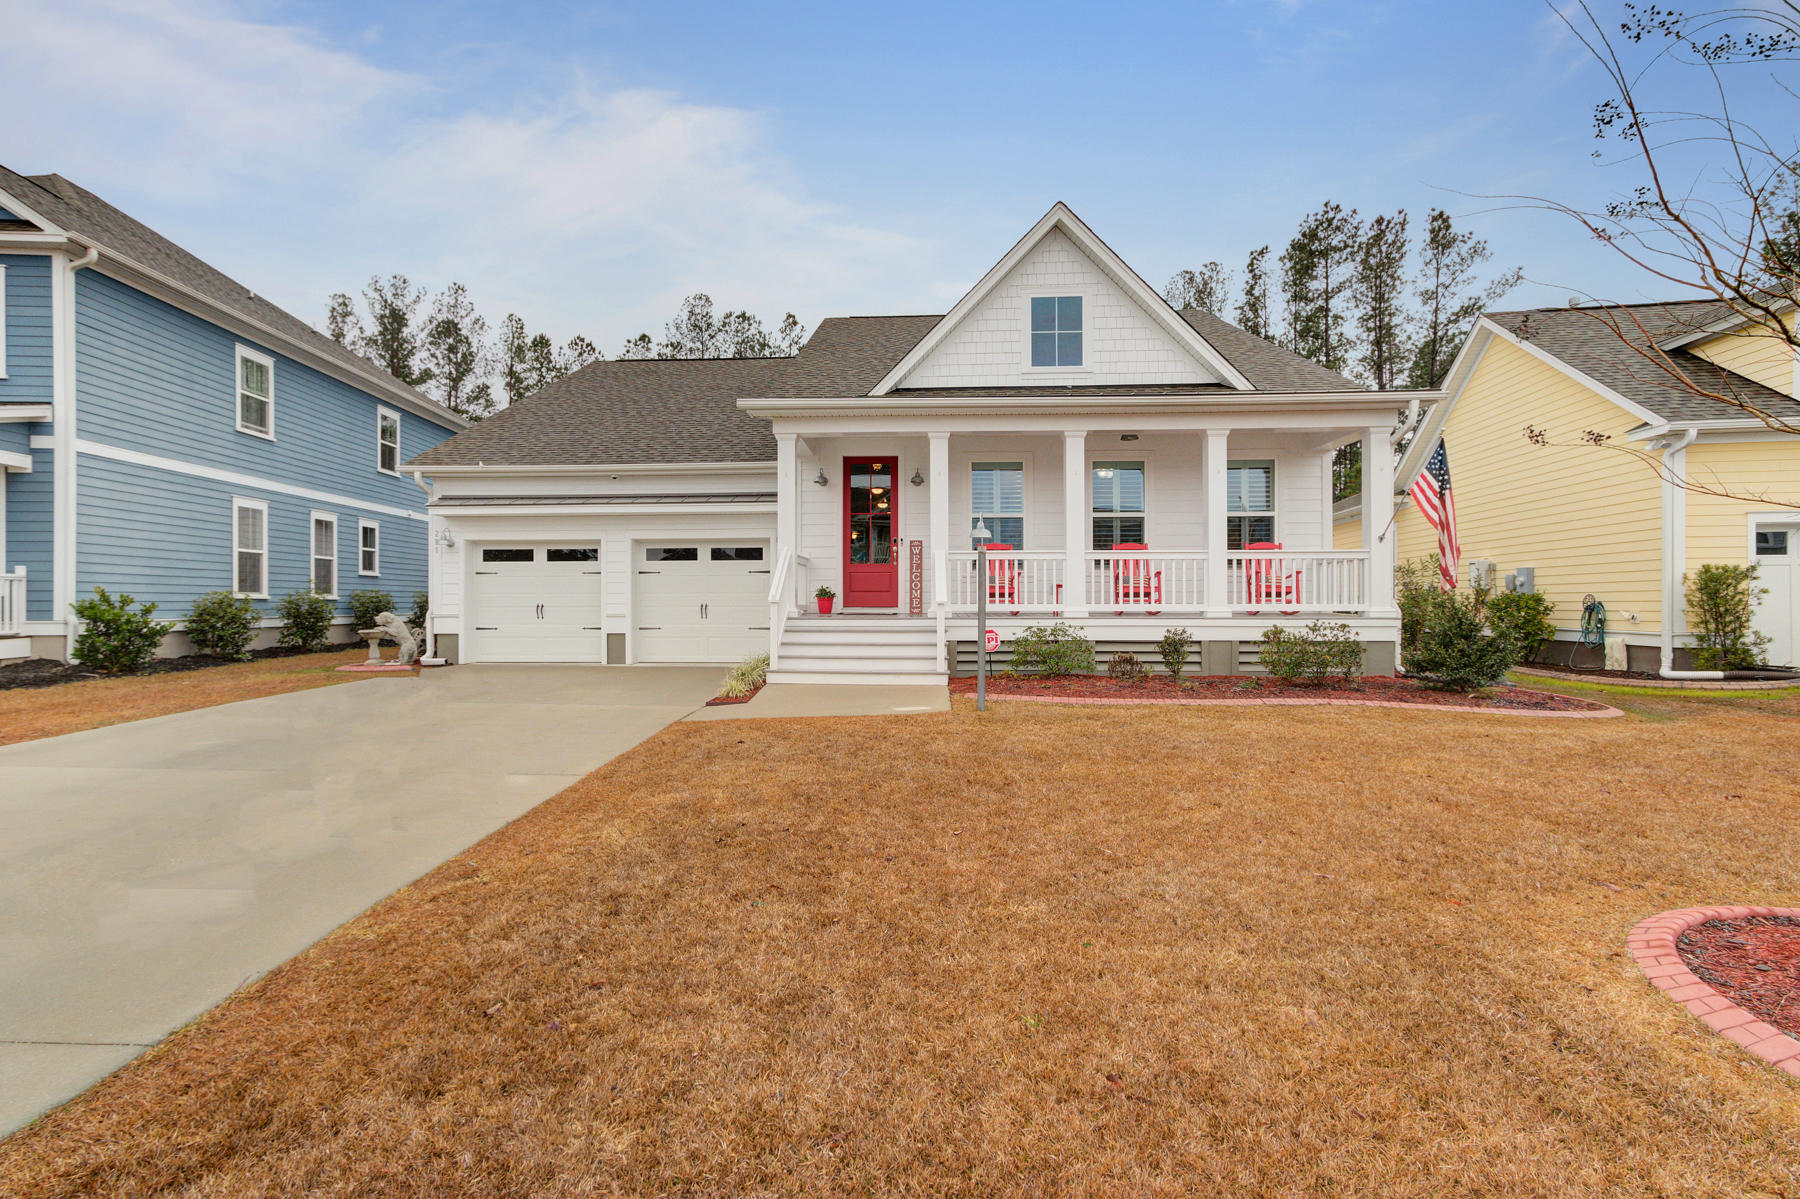 Cane Bay Plantation Homes For Sale - 251 Calm Water, Summerville, SC - 14